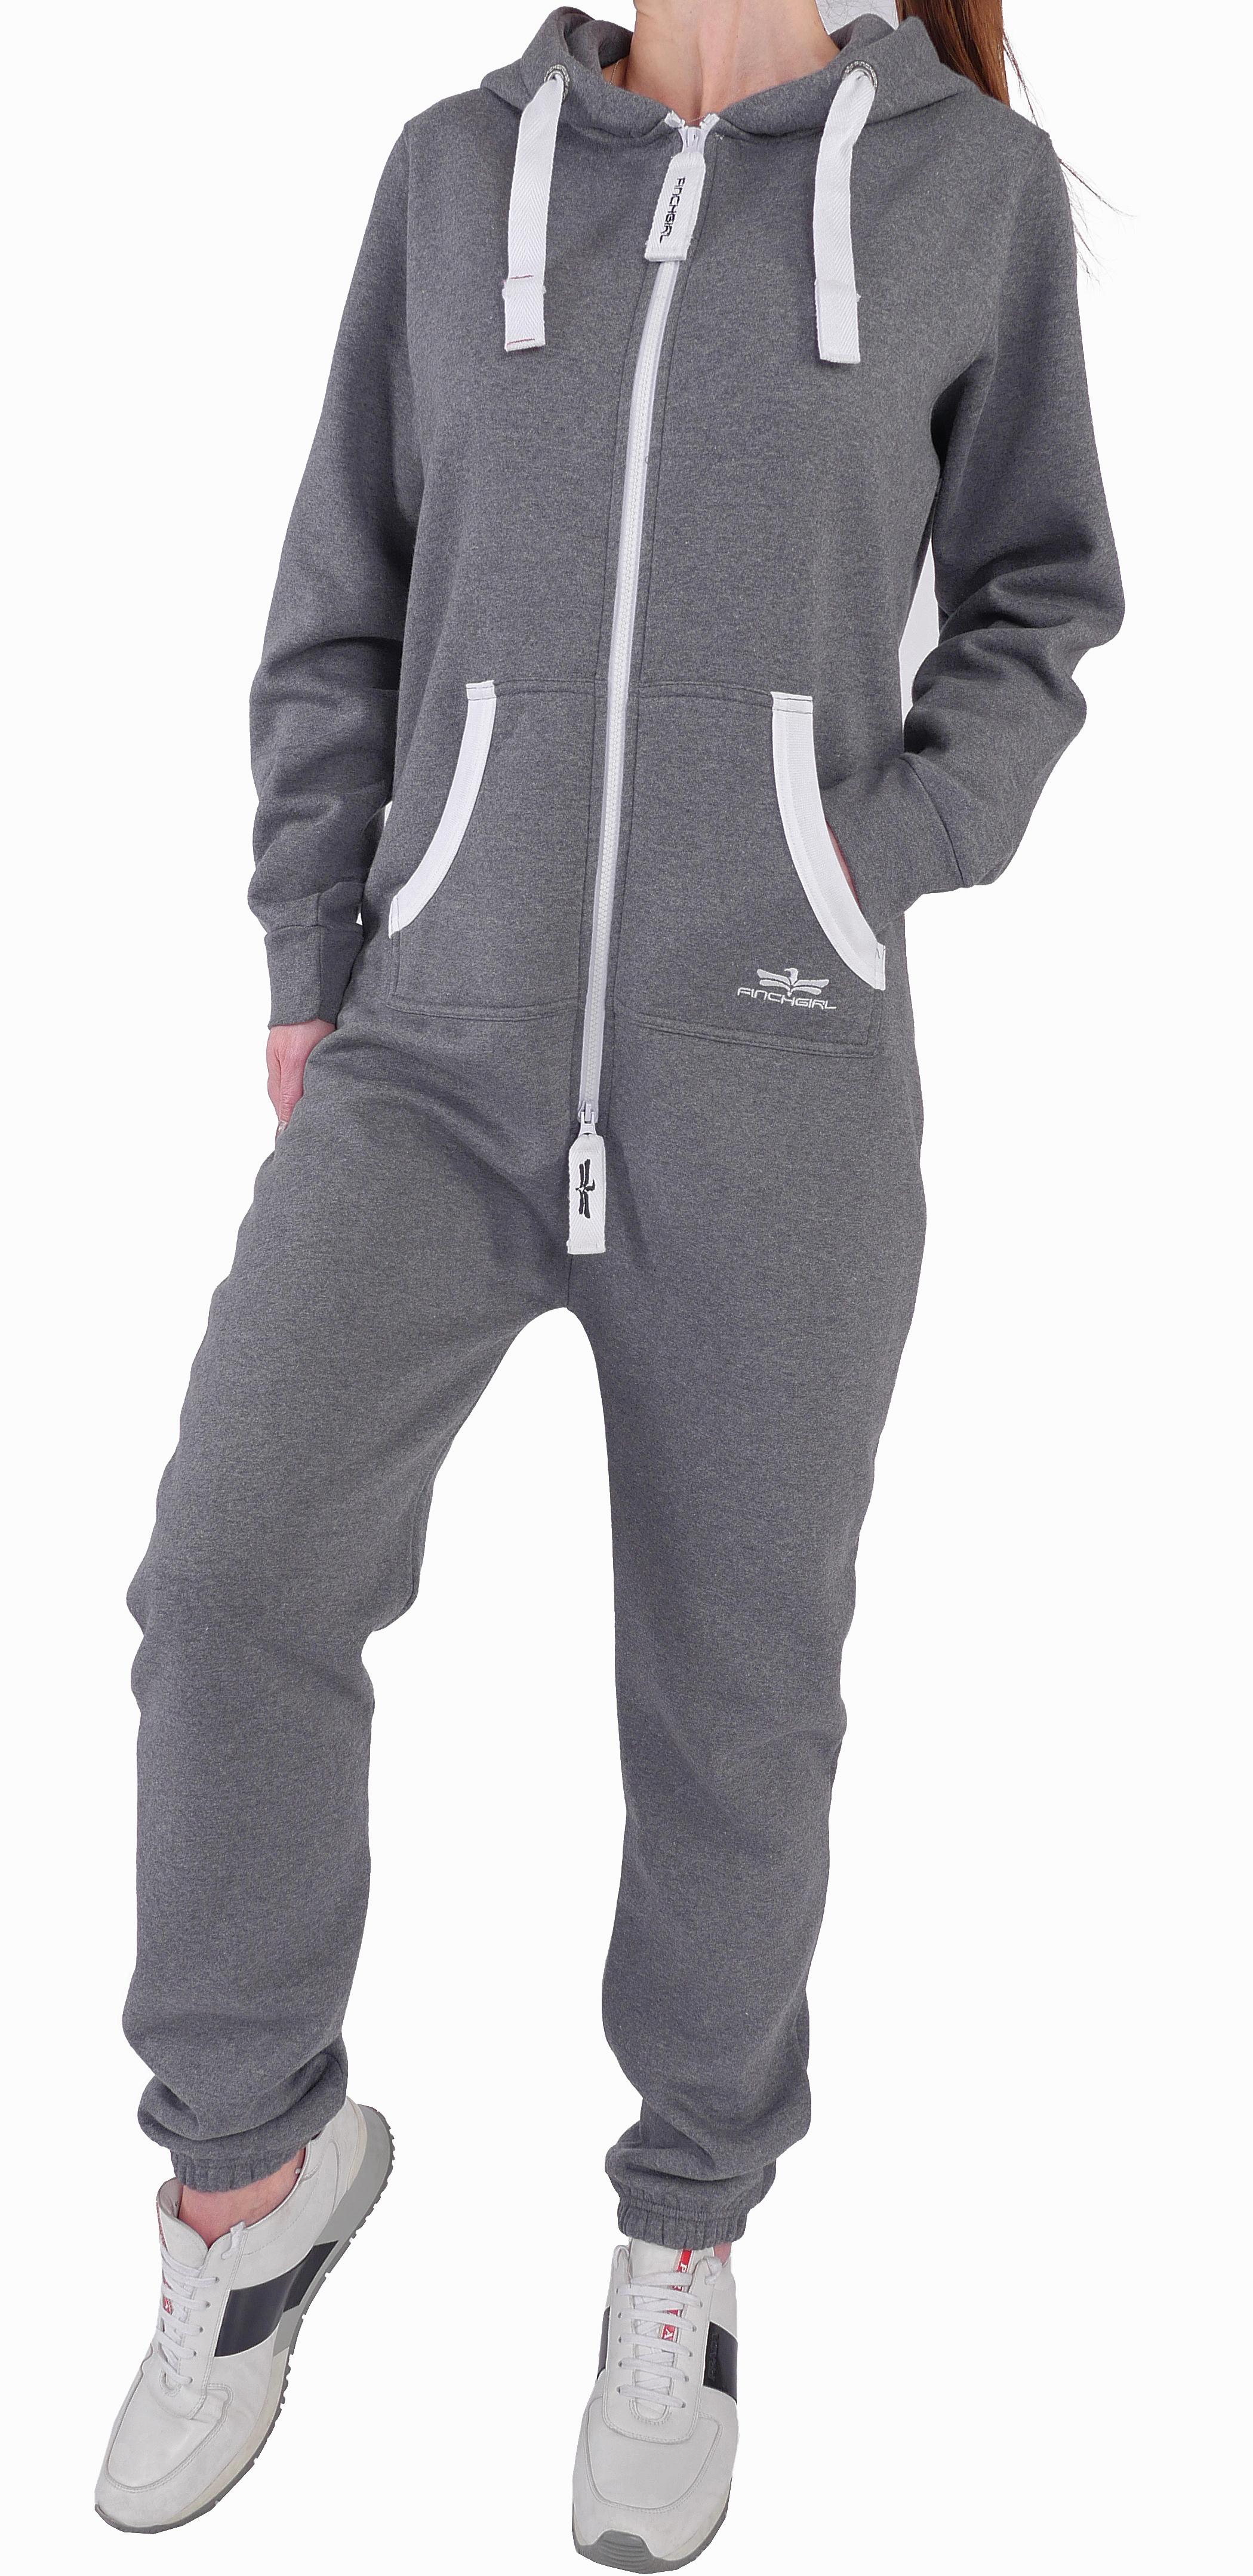 finchgirl damen jumpsuit jogger einteiler jogging anzug trainingsanzug overall ebay. Black Bedroom Furniture Sets. Home Design Ideas